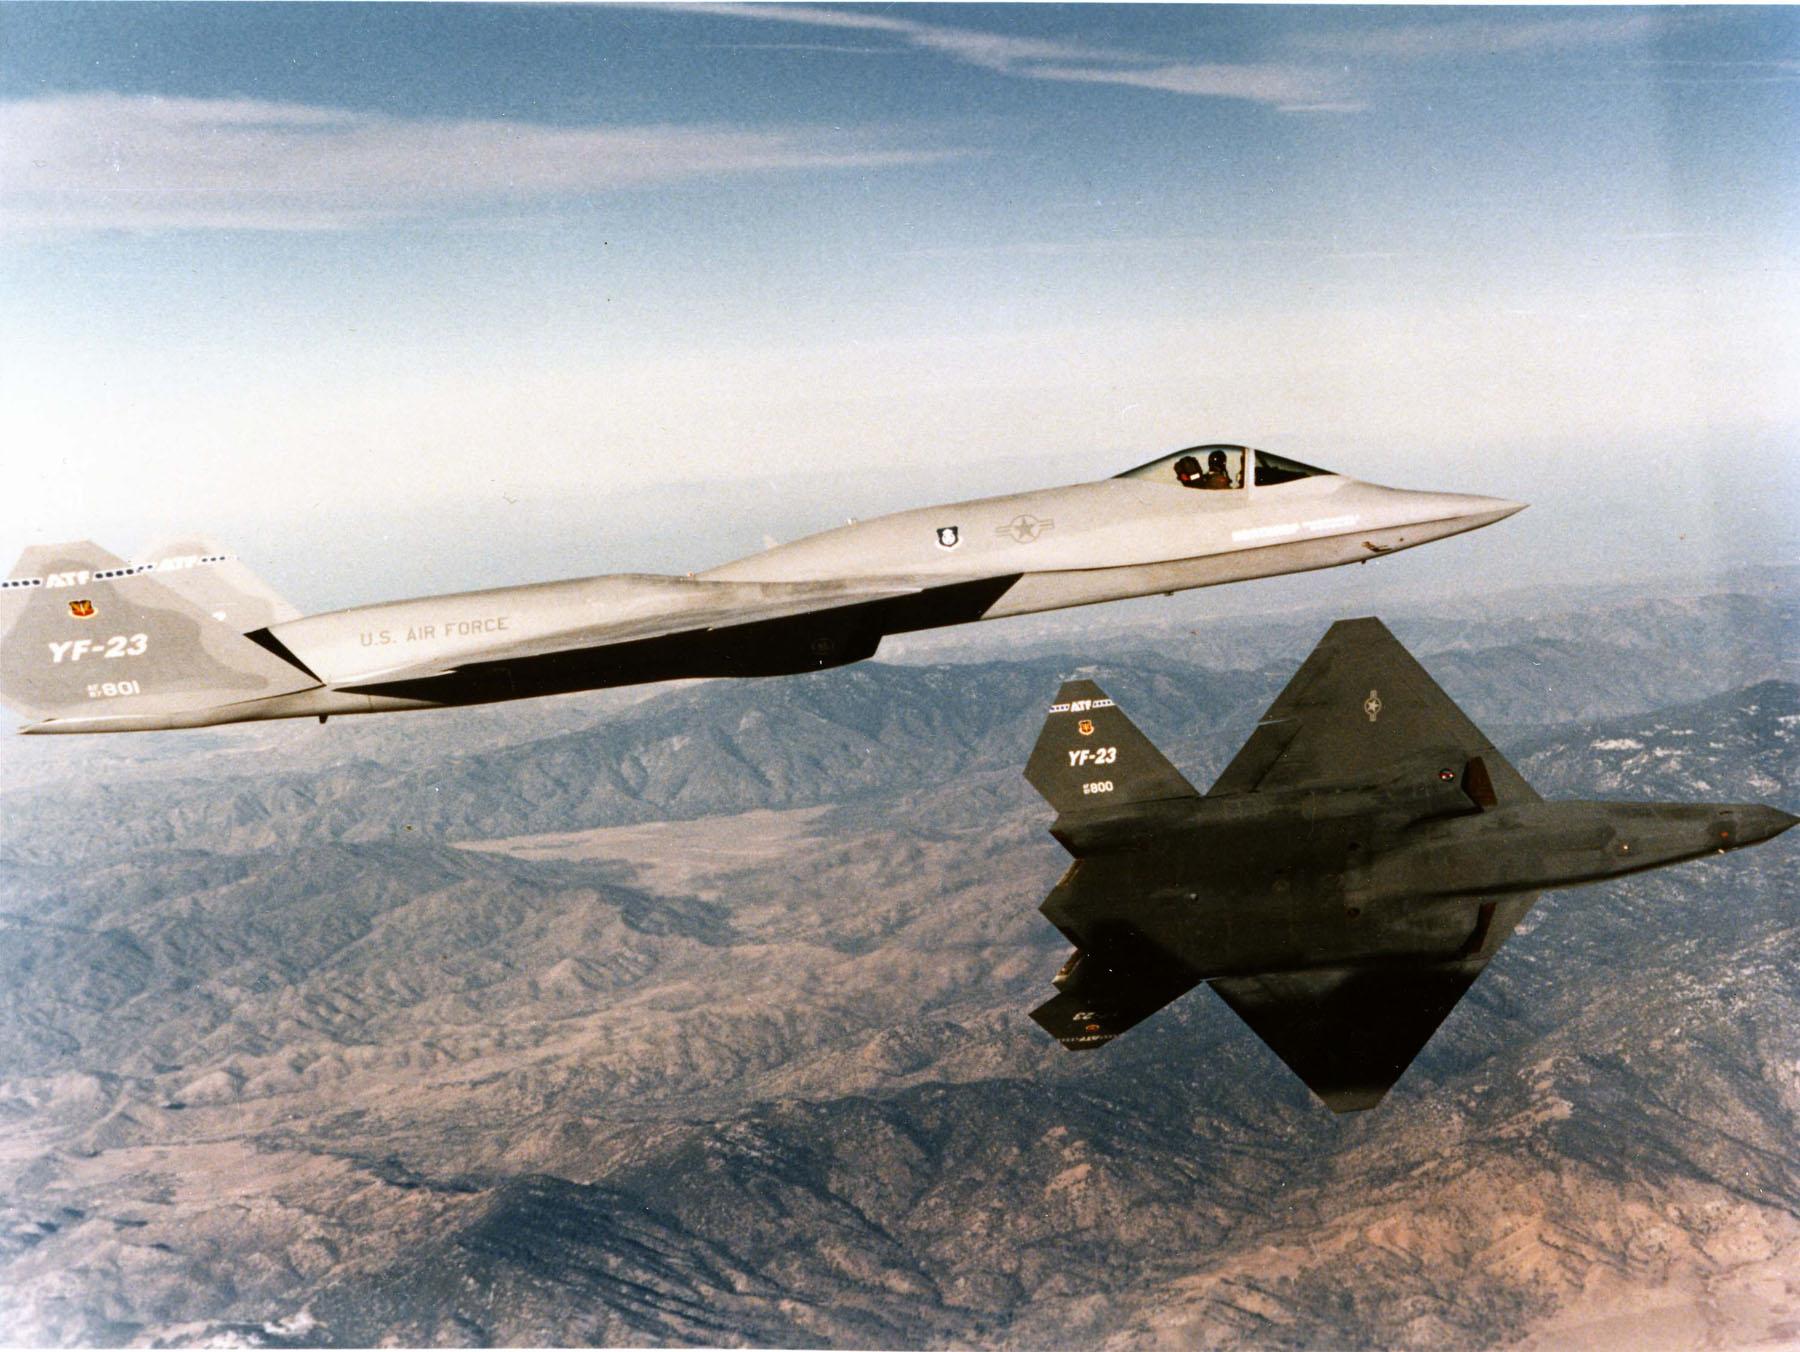 YF 23 (航空機)の画像 p1_21